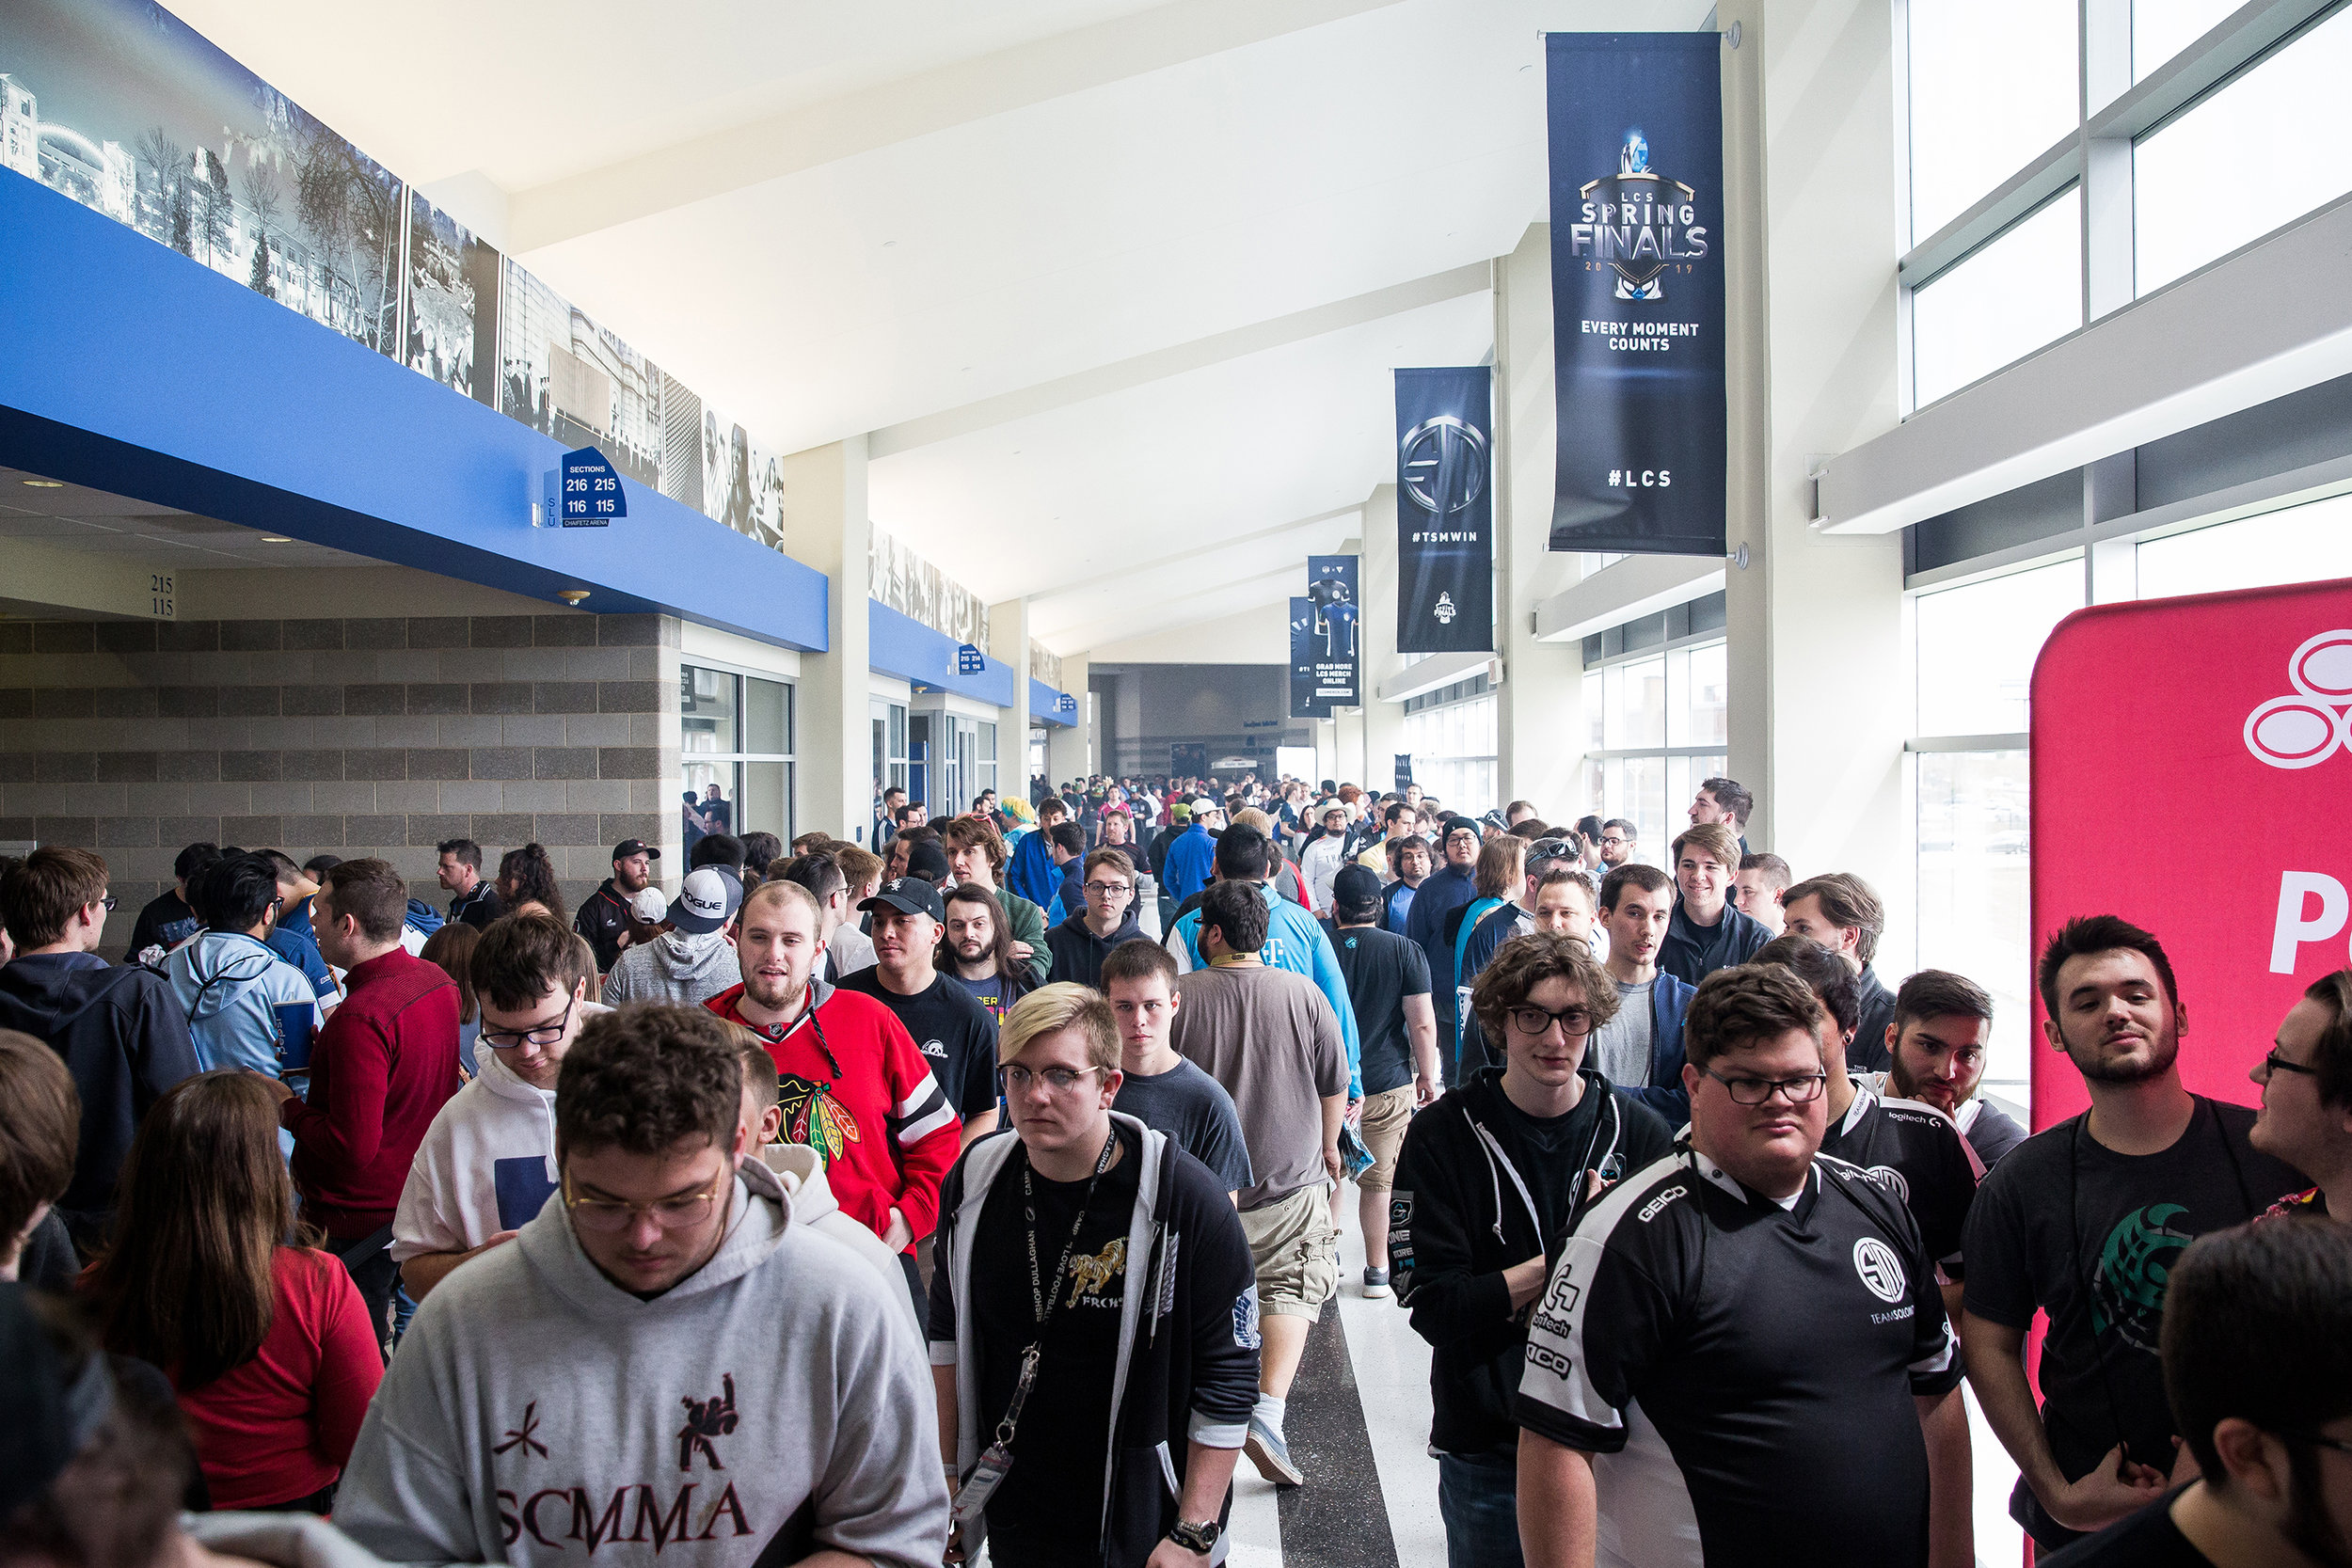 ST LOUIS, MO - APRIL 13: League of Legends fans entering venue at LCS Spring Finals at Chaifetz Arena on April 13, 2019 in St Louis, Missouri. Photo by David Doran/ESPAT Media